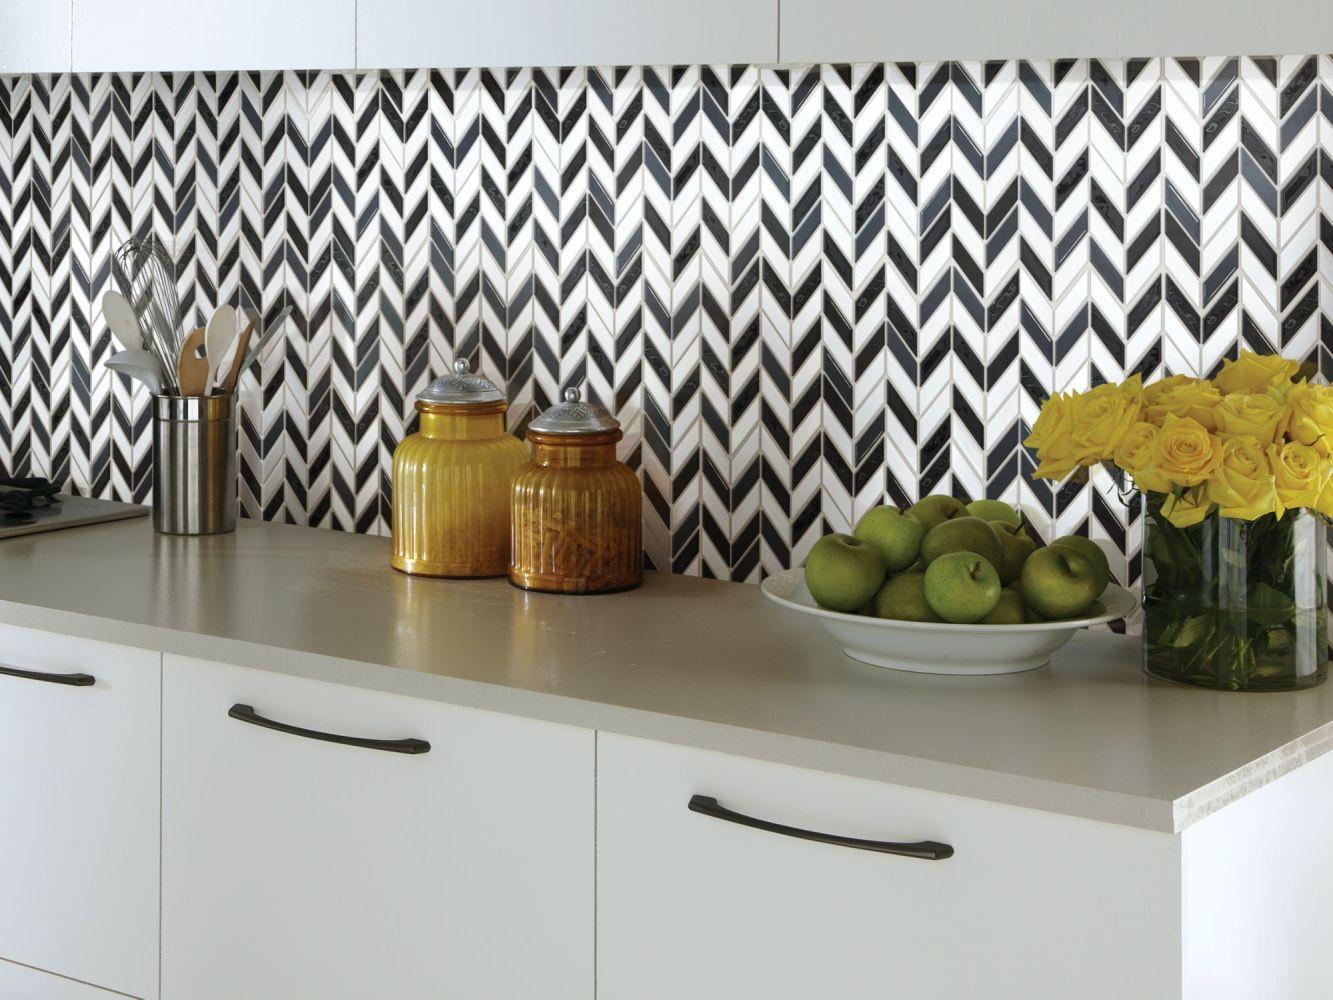 Shaw Floors Toll Brothers Ceramics Geoscapes Chevron Black/White Blend 00151_TL46C